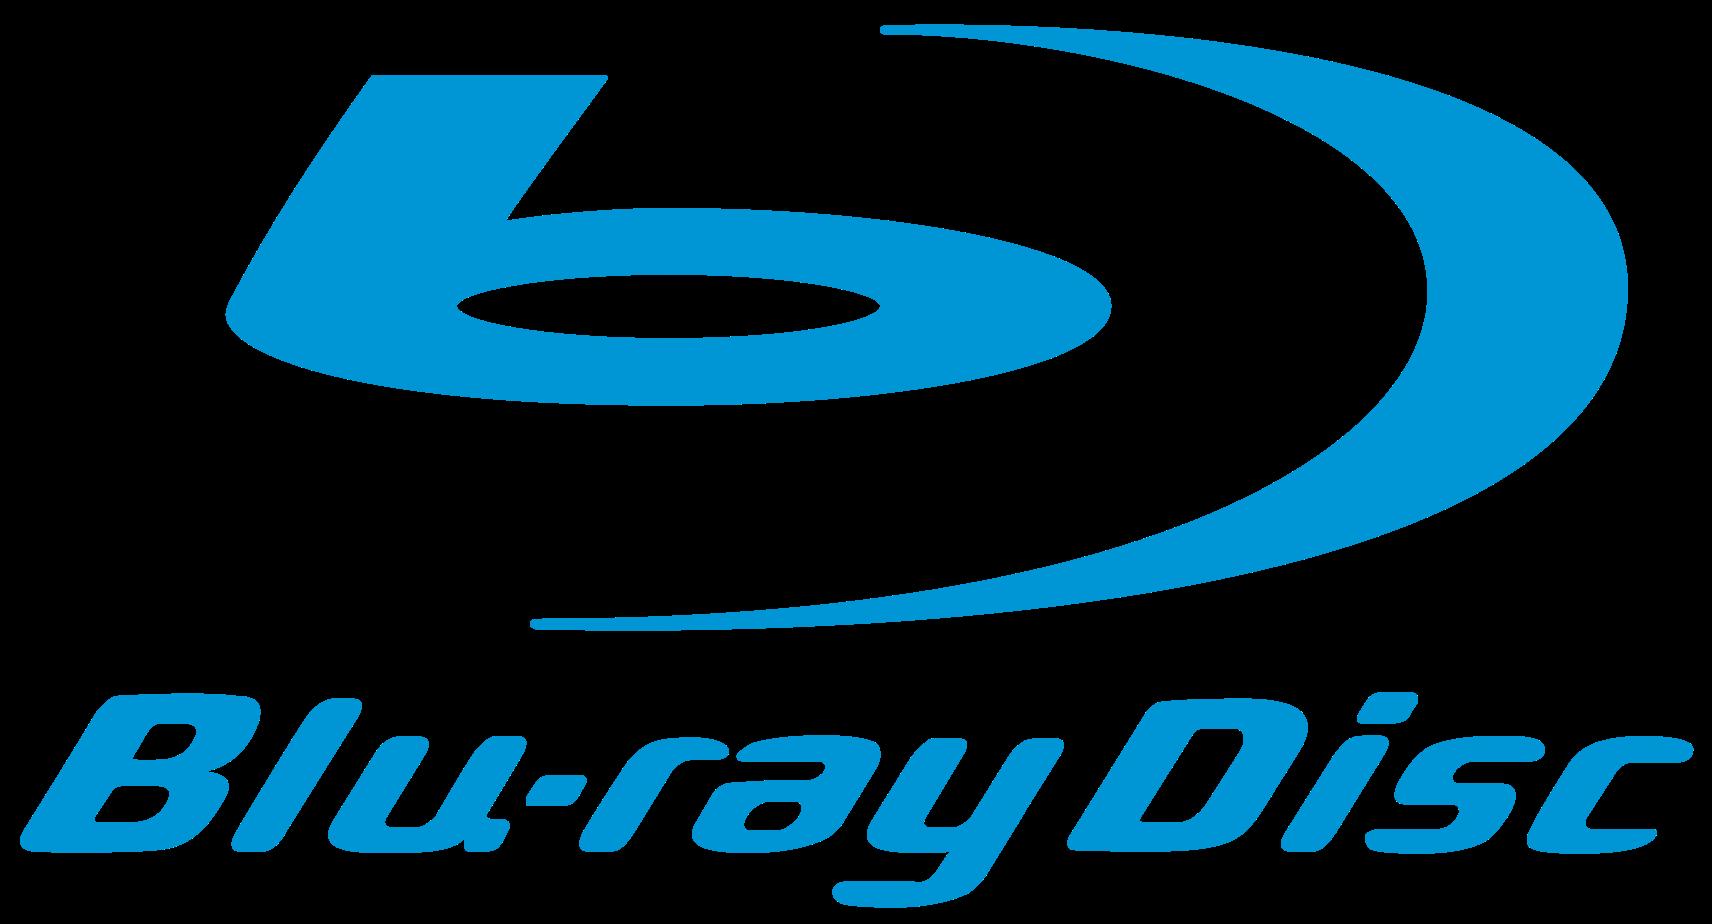 Blu-Ray Videos